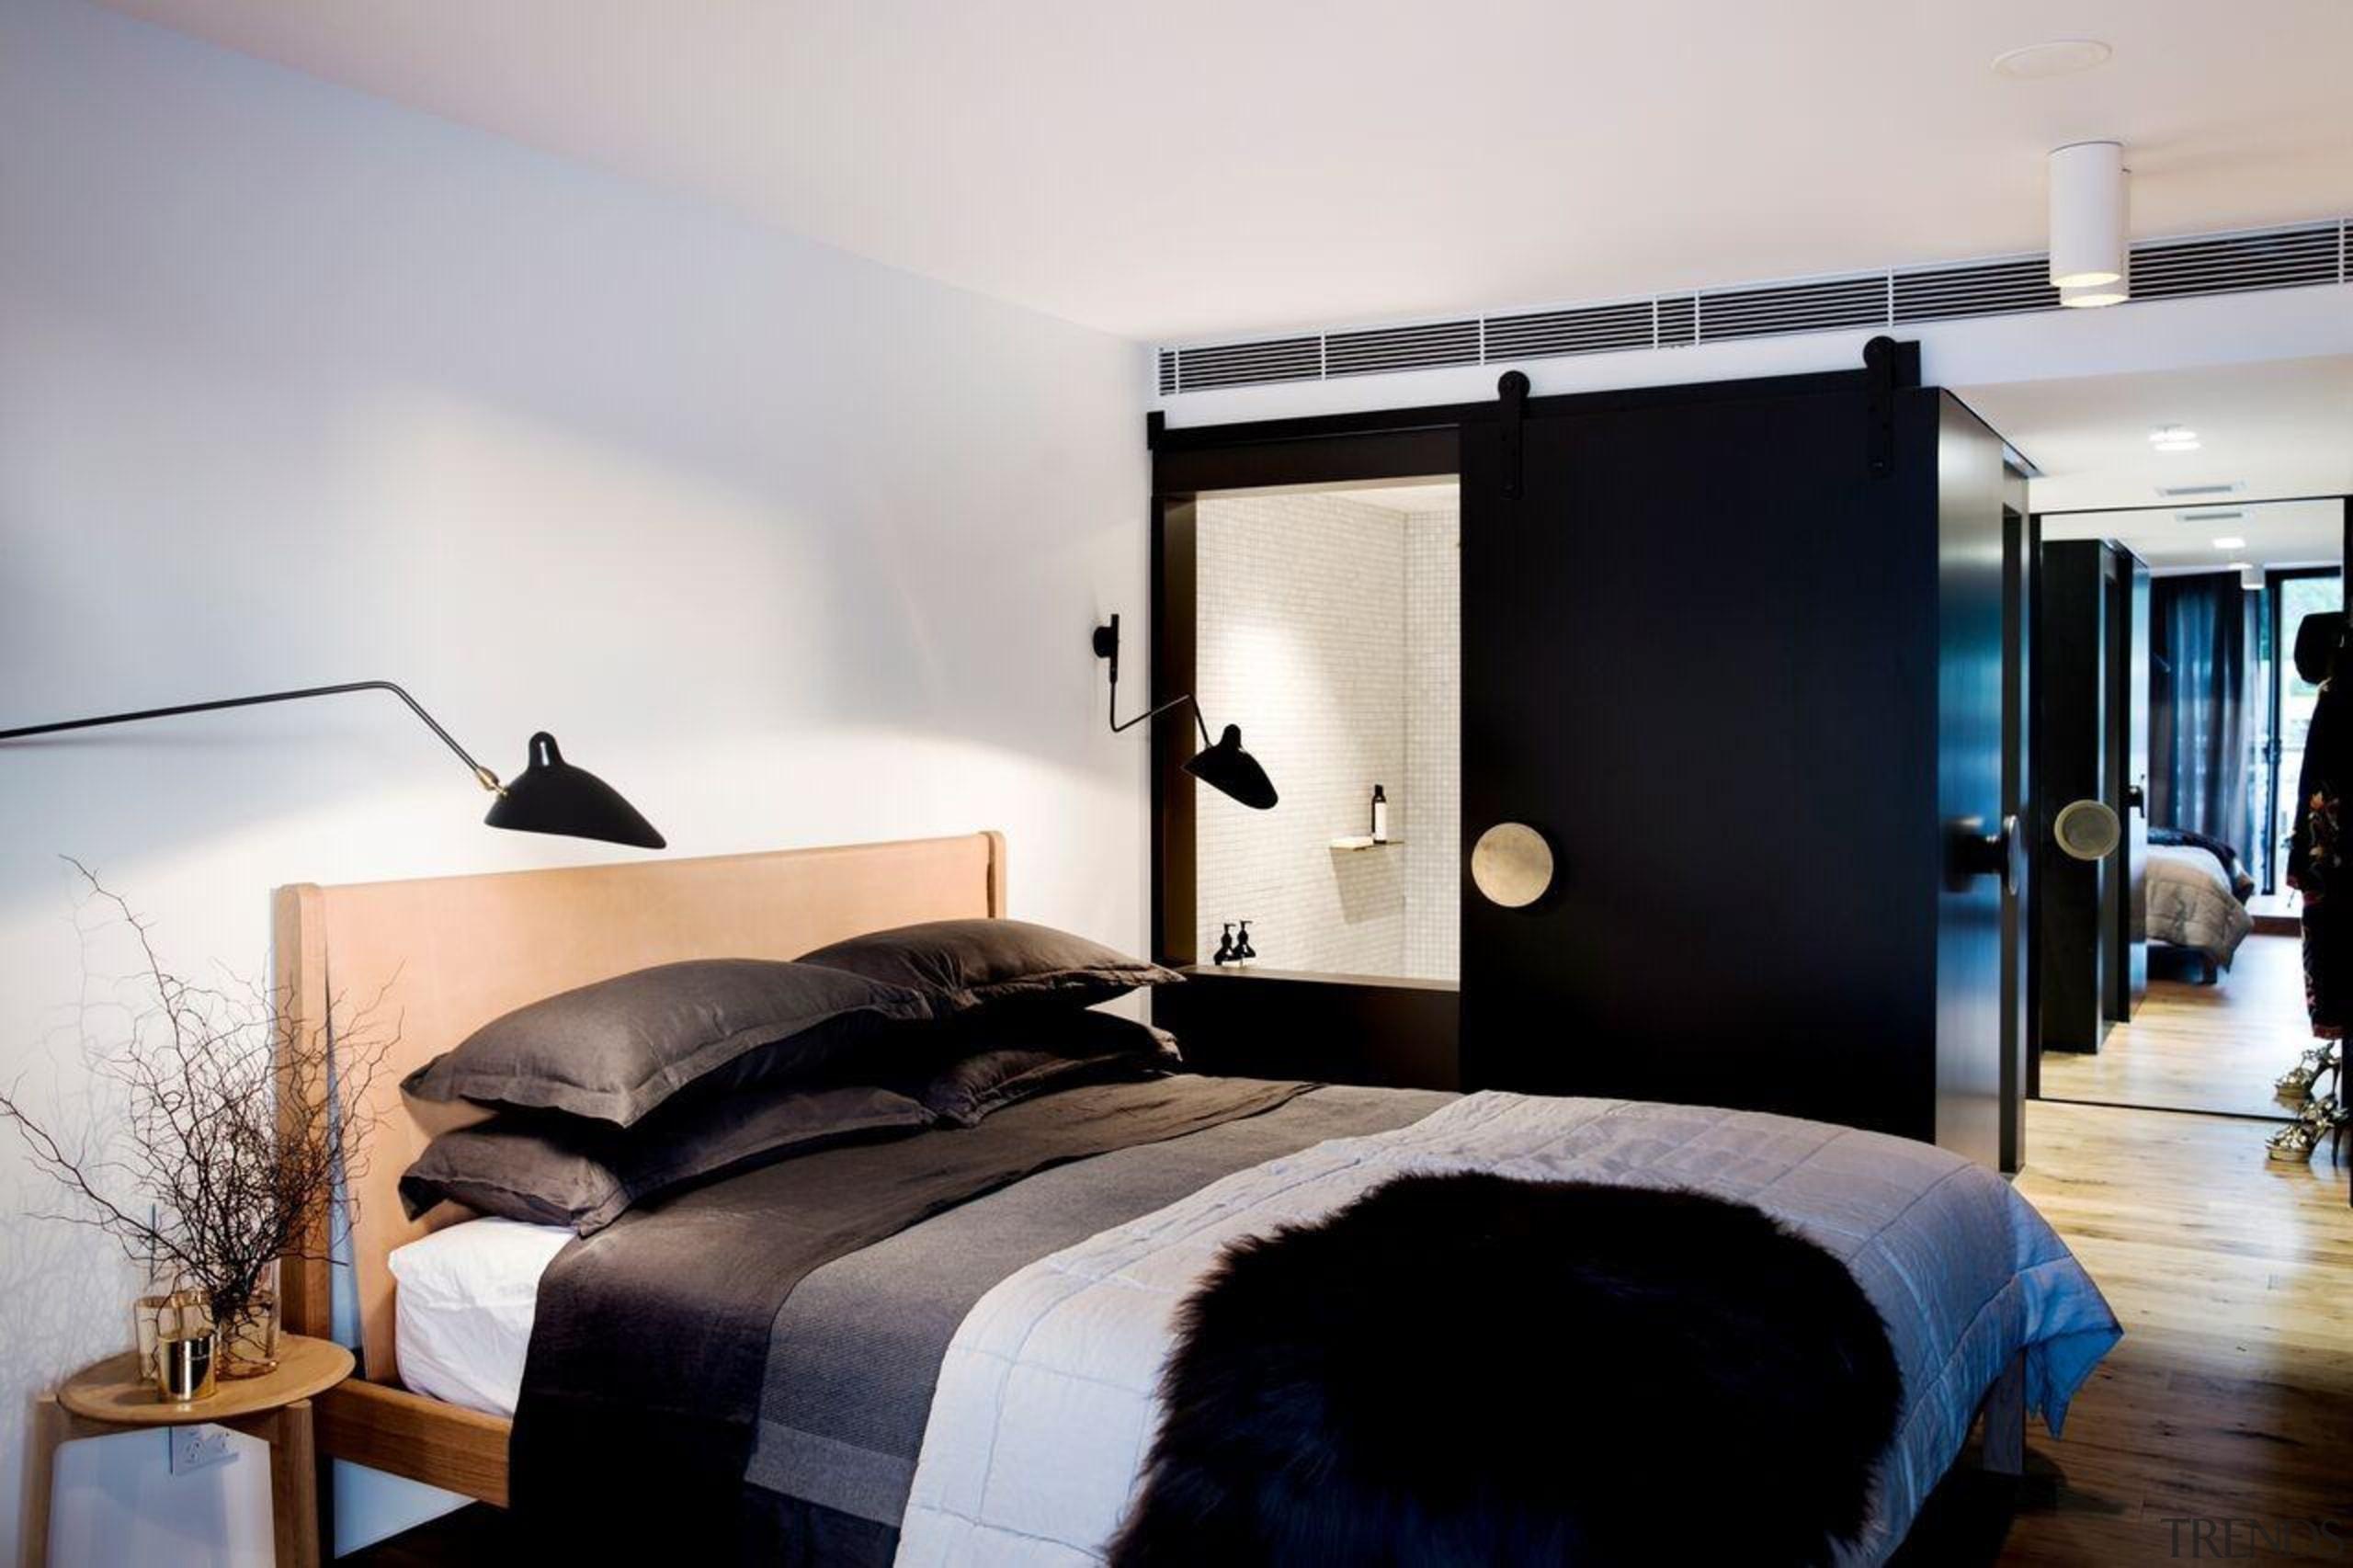 Architect: Architect Prinea - X - bed | bed, bed frame, bedroom, furniture, interior design, room, suite, white, black